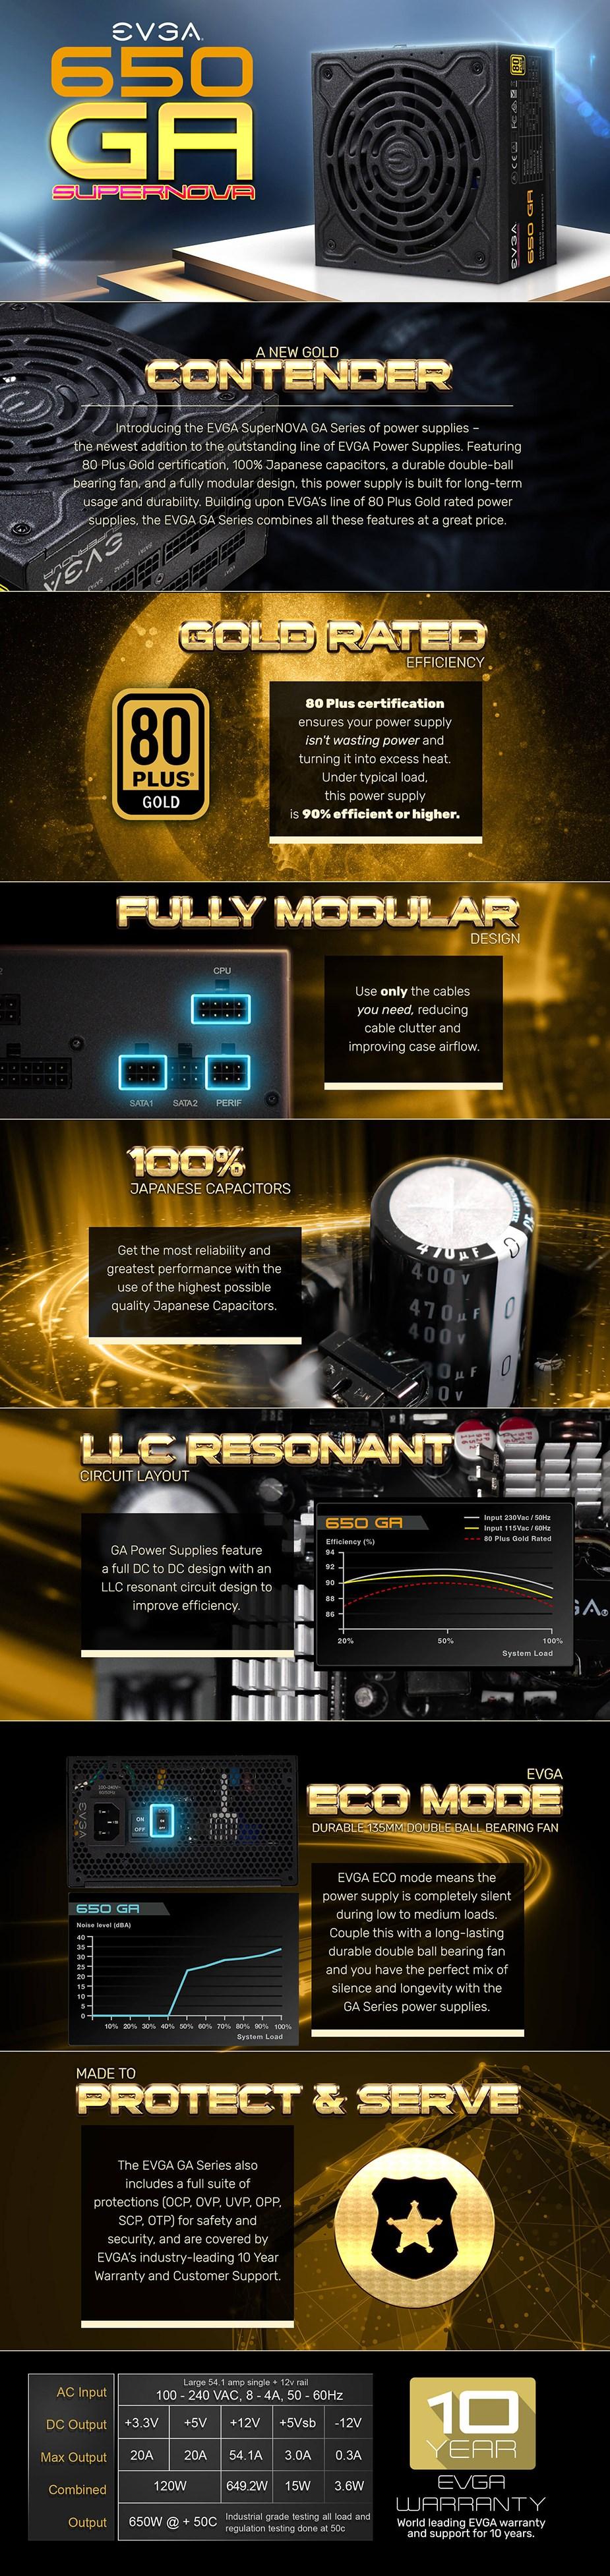 EVGA SuperNOVA 650W GA 80+ Gold Fully Modular Power Supply - Overview 1